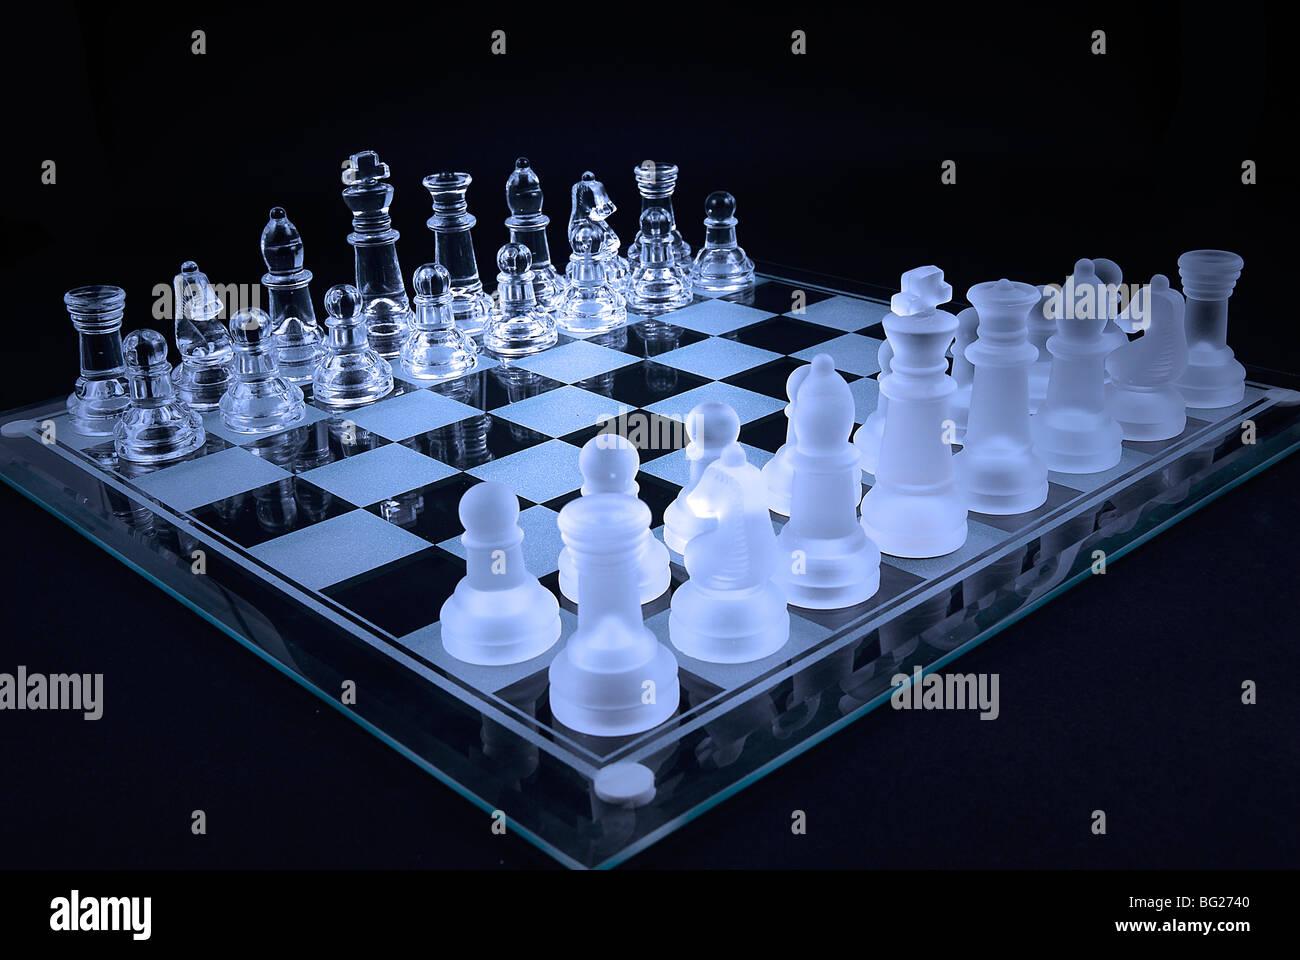 Un jeu d'échecs en verre lumineux Banque D'Images